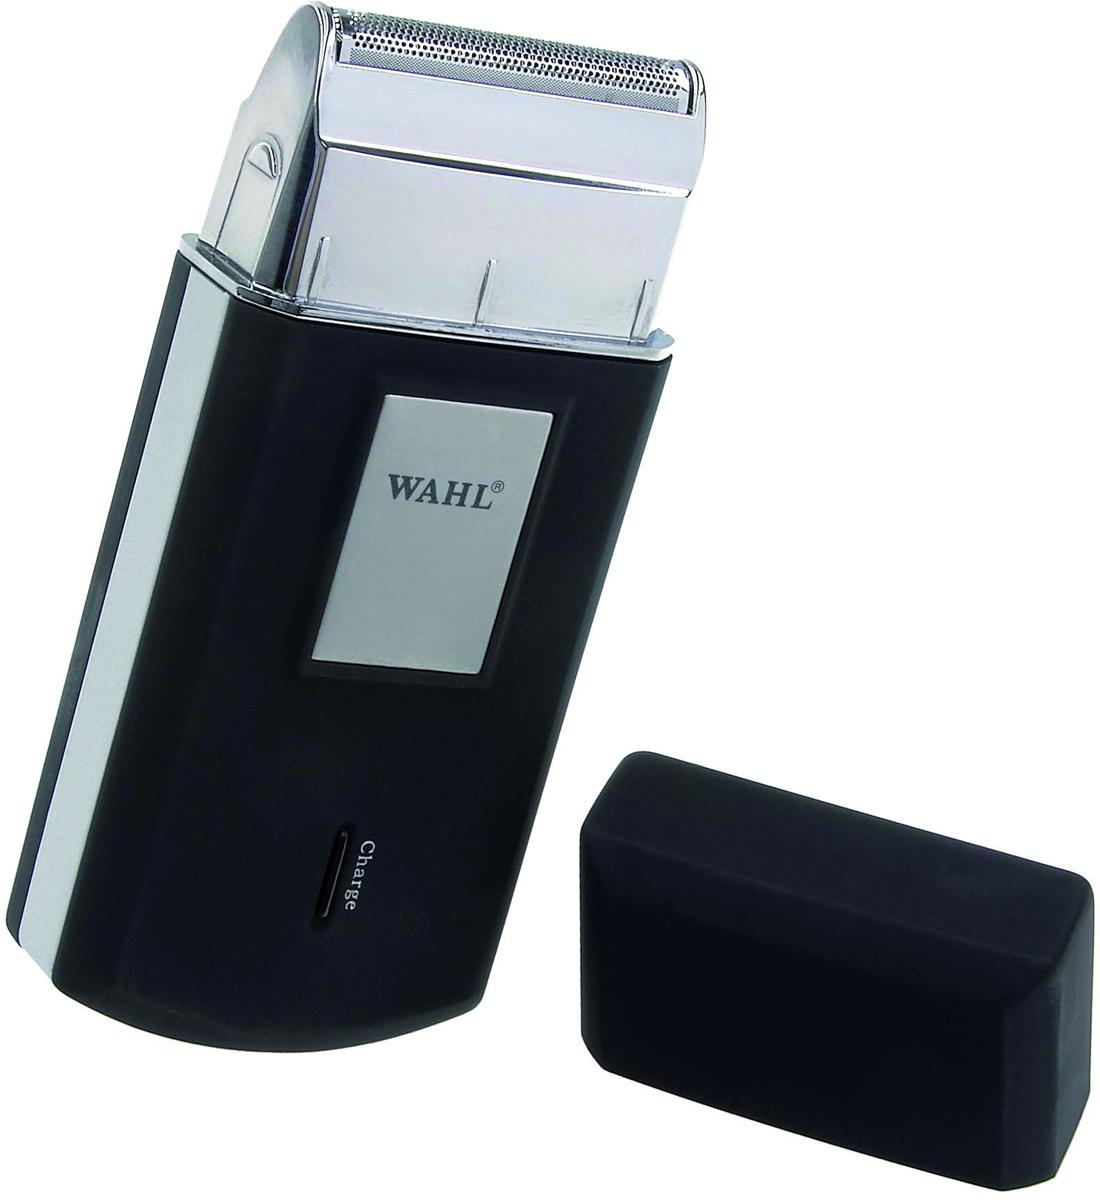 Wahl Mobile 3615-0471 электробритва